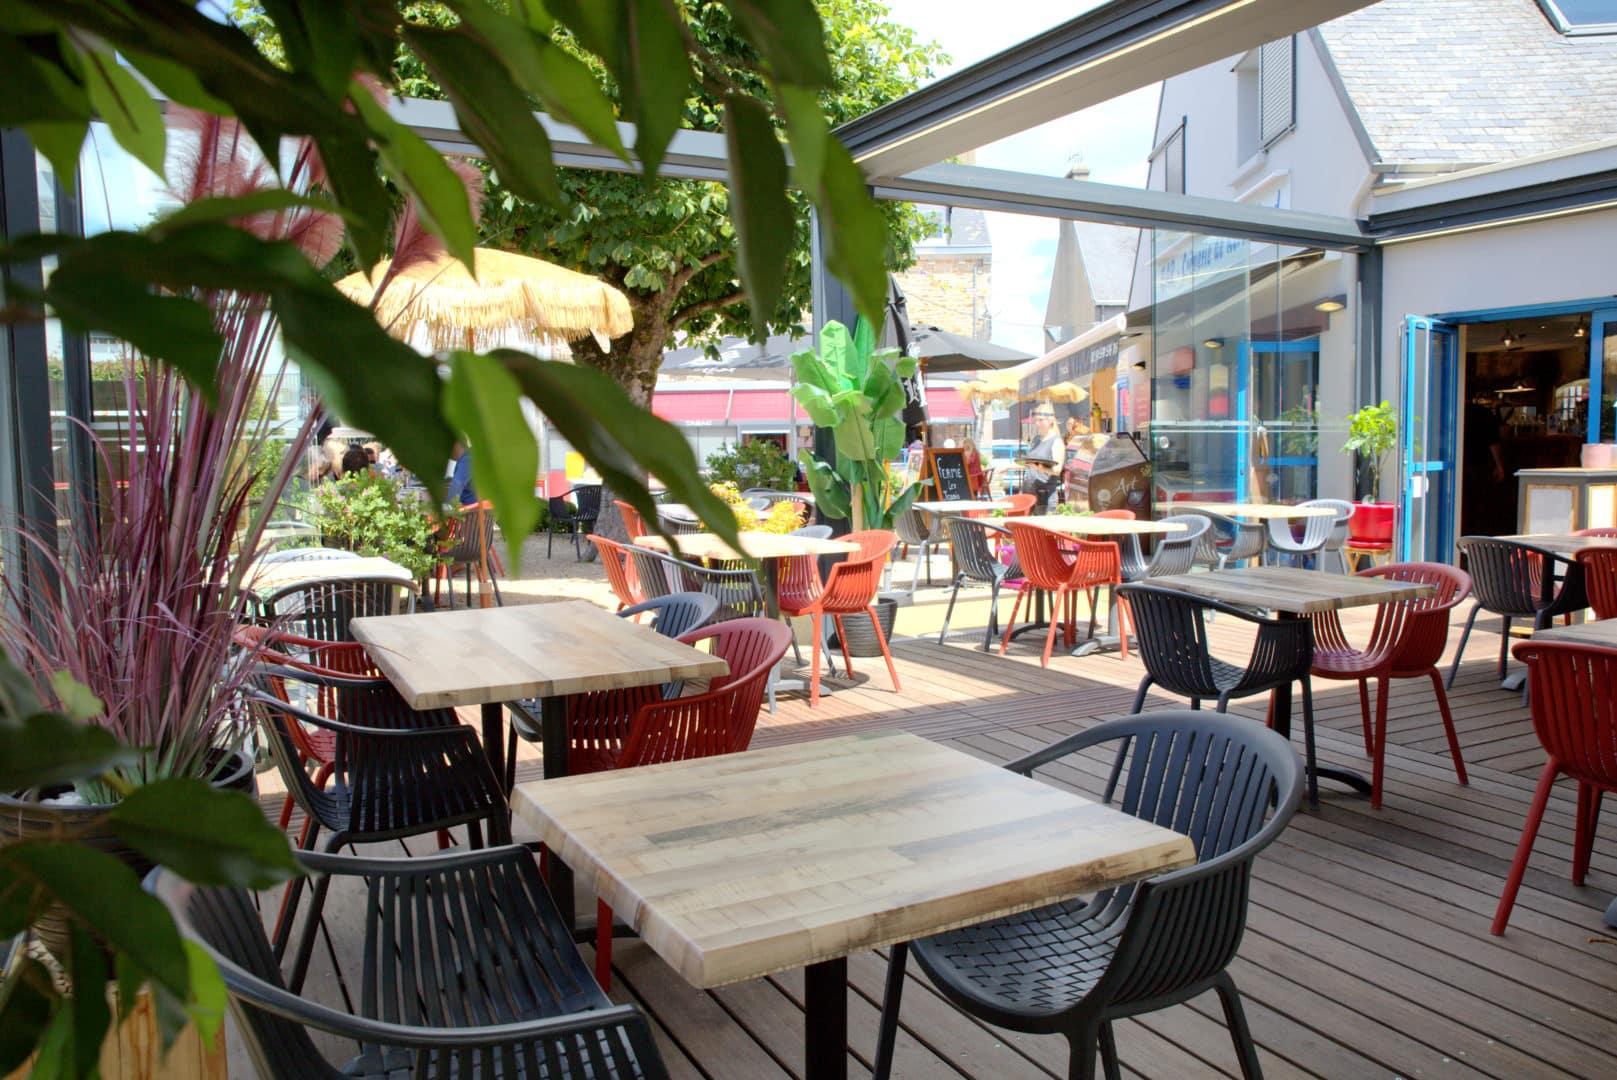 Creperie de Kervastard Fouesnant Bar crepes restaurant snack glaces 3 - Accueil